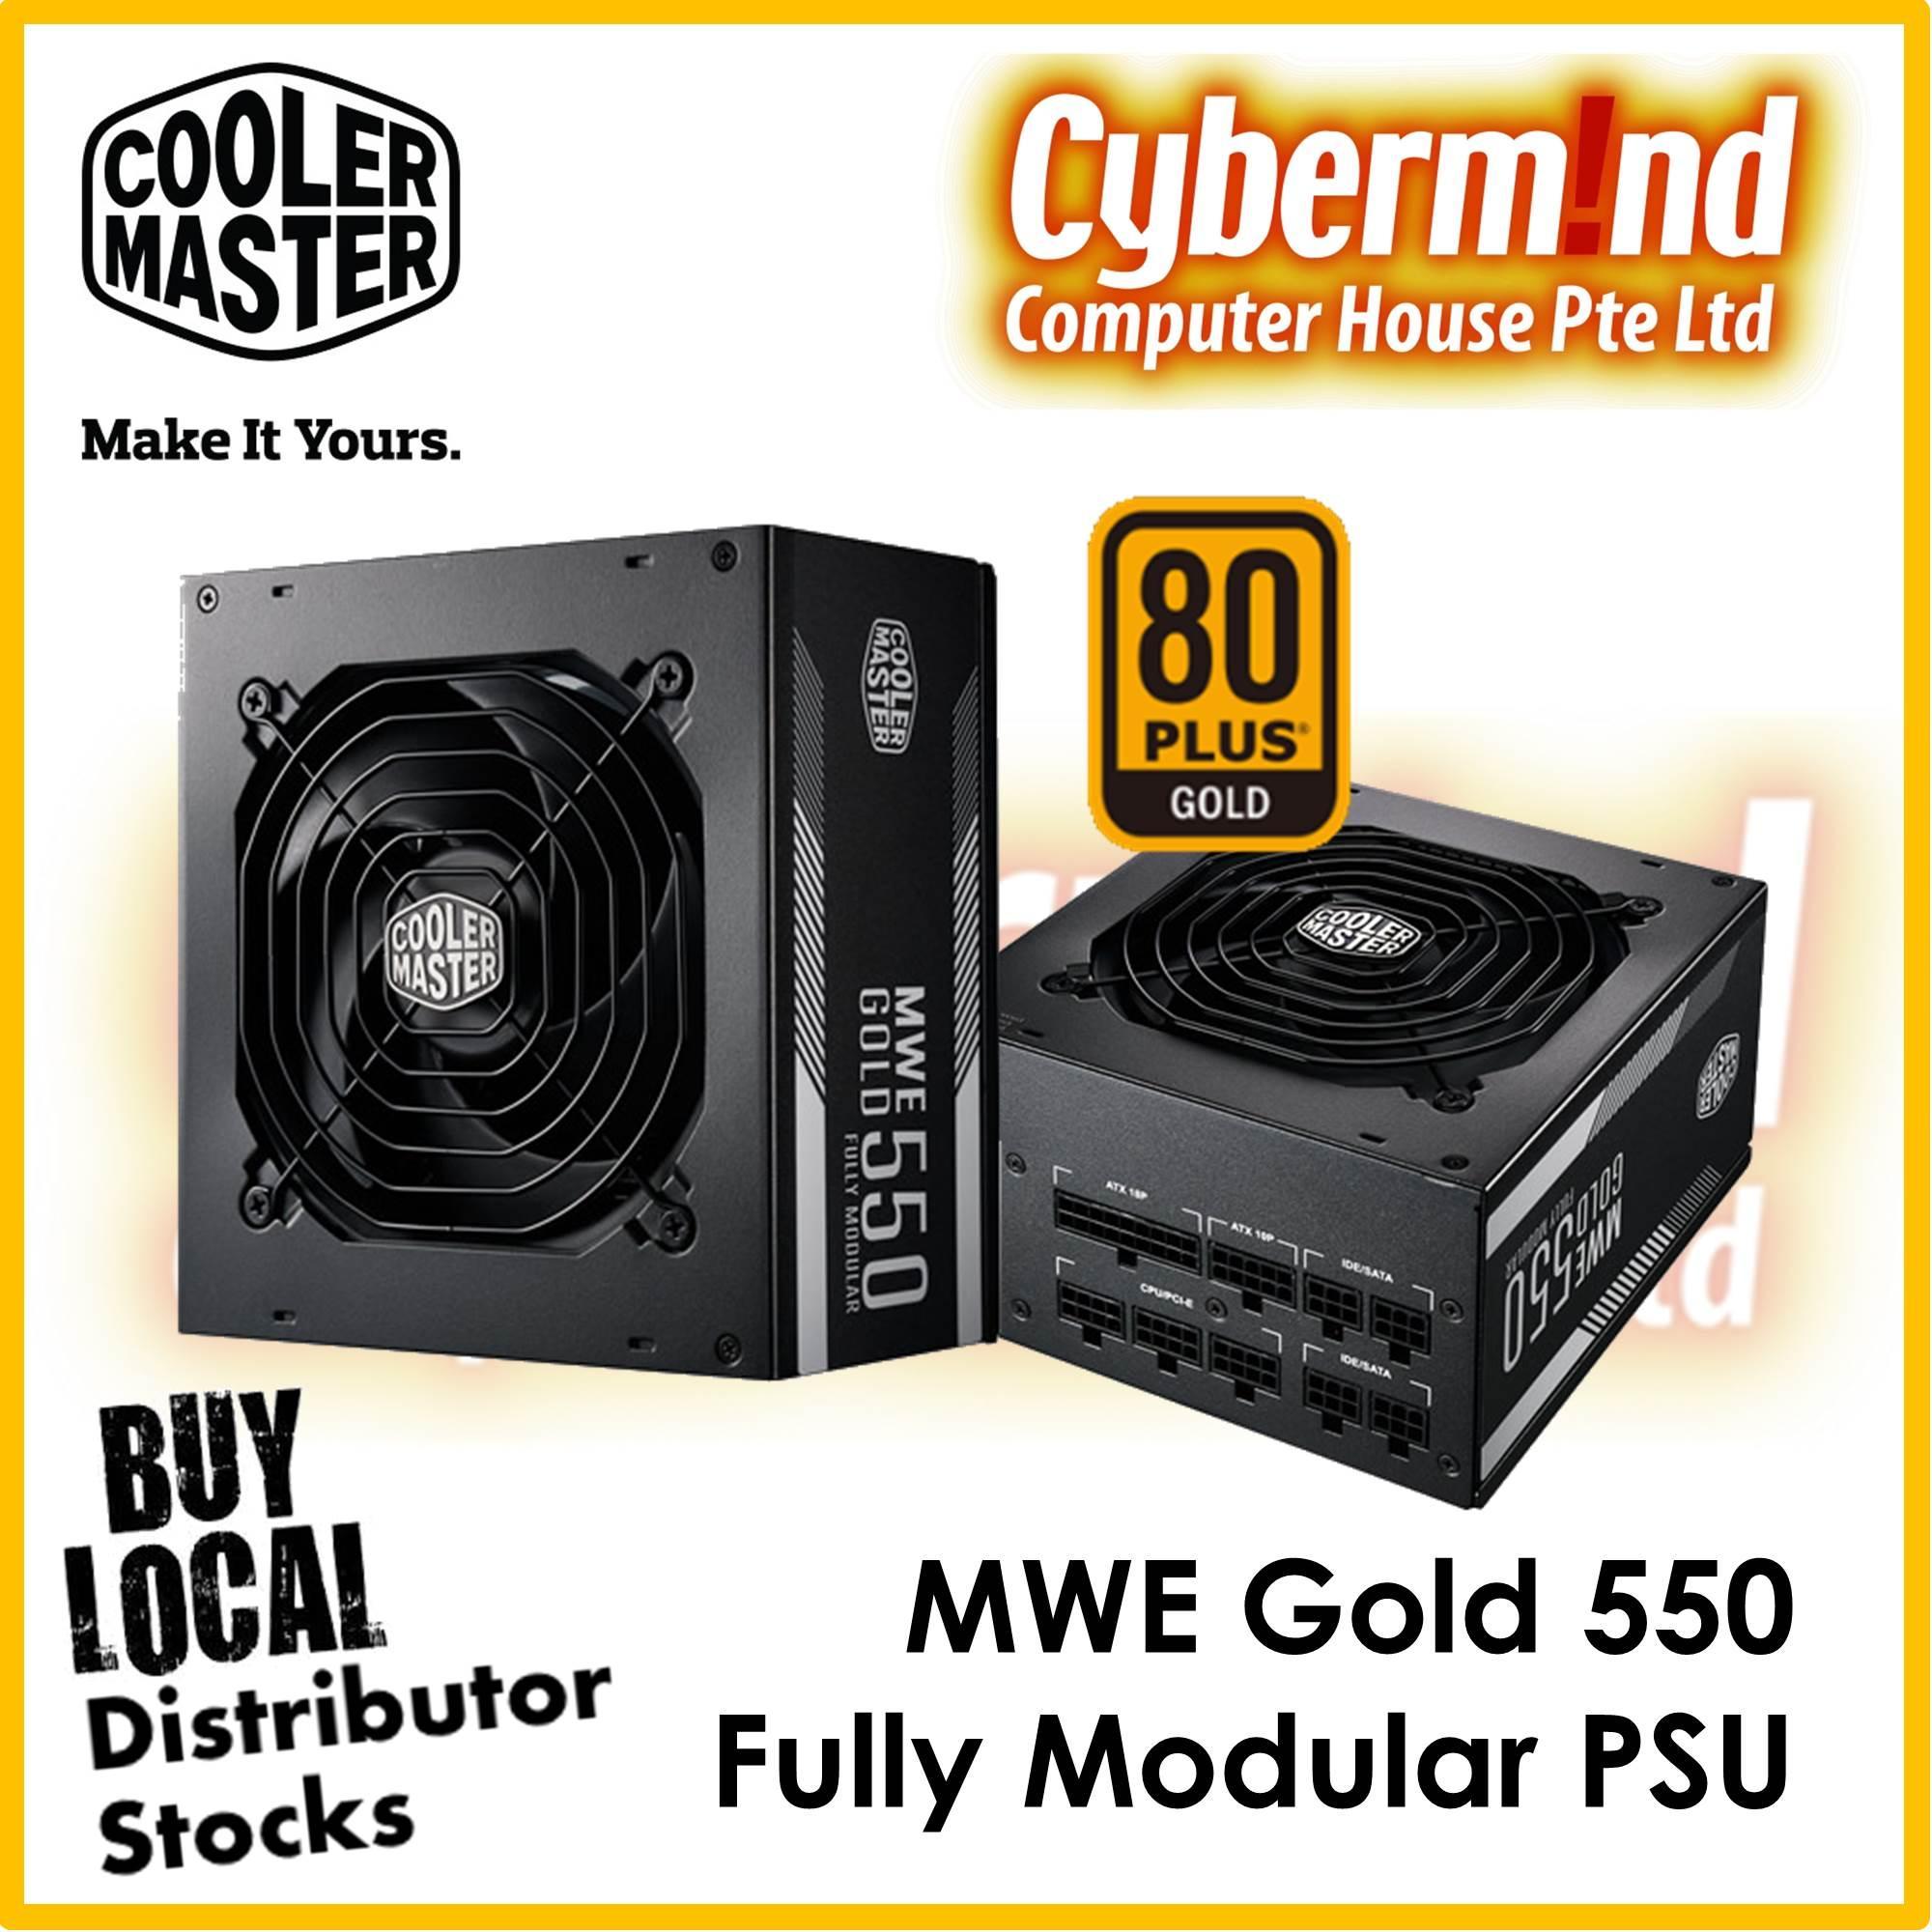 Buy Power Supply Units Pc Lazada Corsair Vs550 Vs 550 Cooler Master Coolermaster Mwe Gold Fully Modular 80 Brought